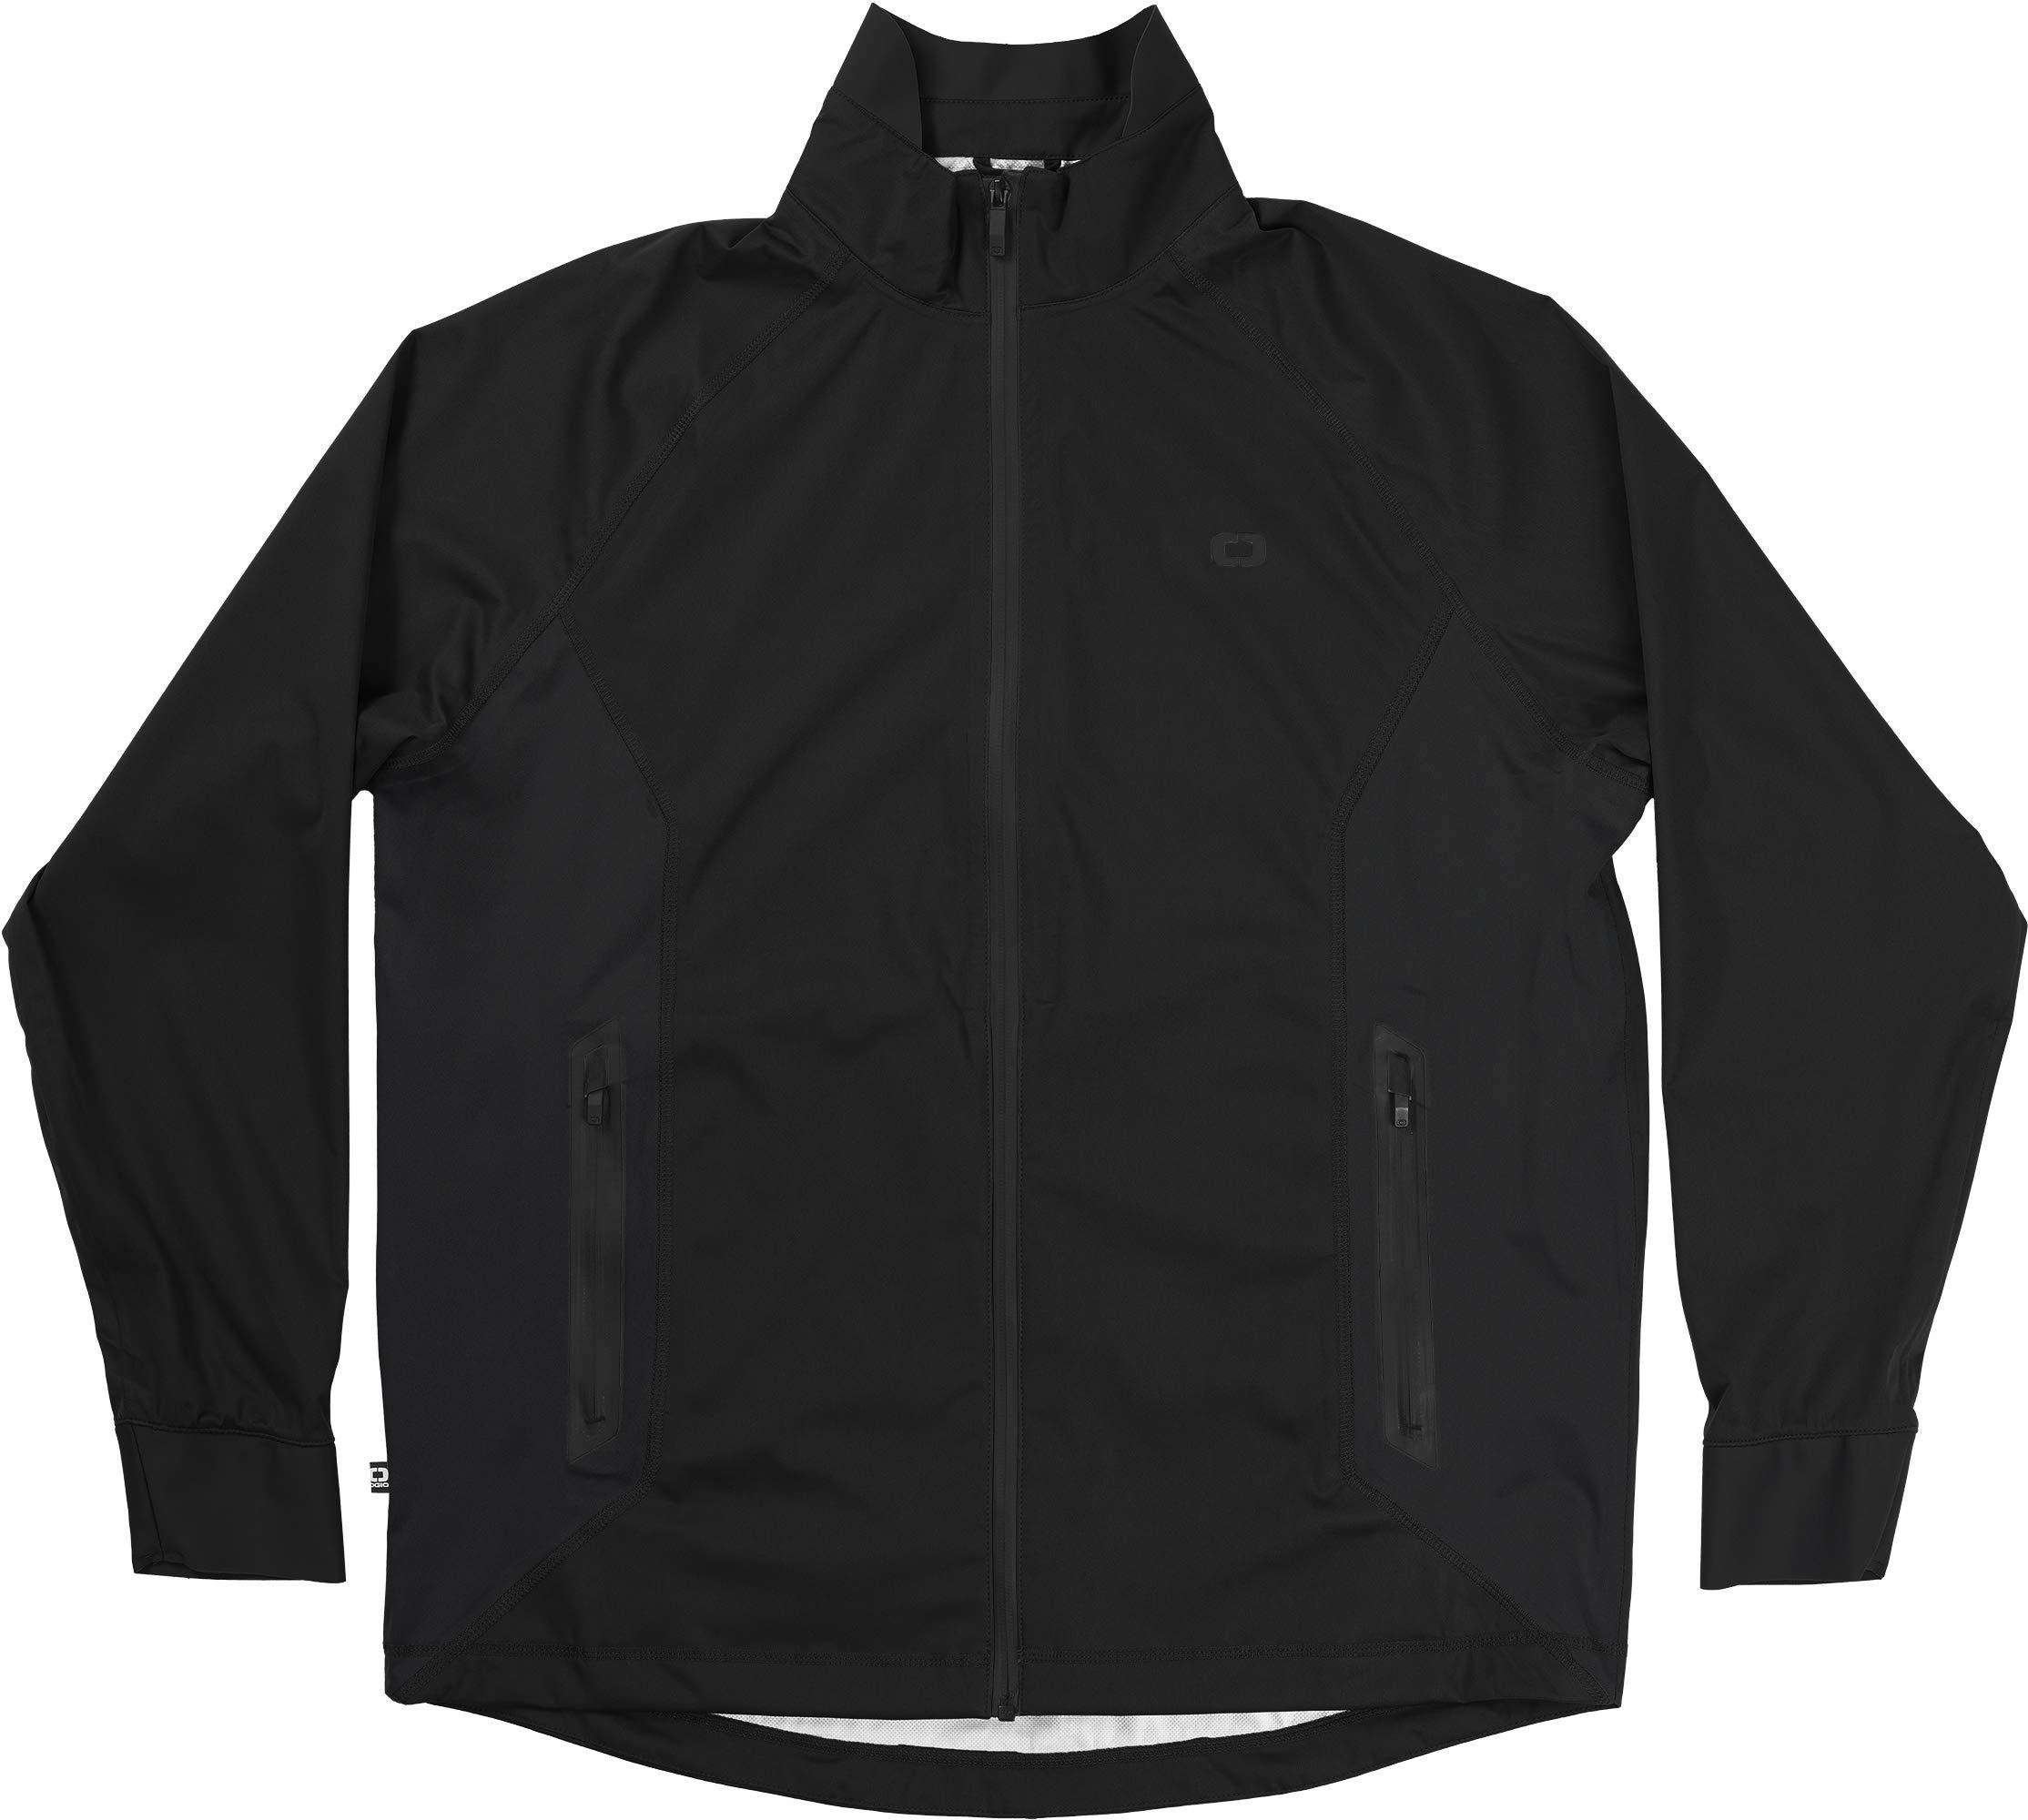 Ogio All Elements Rain Jacket, Black, Small